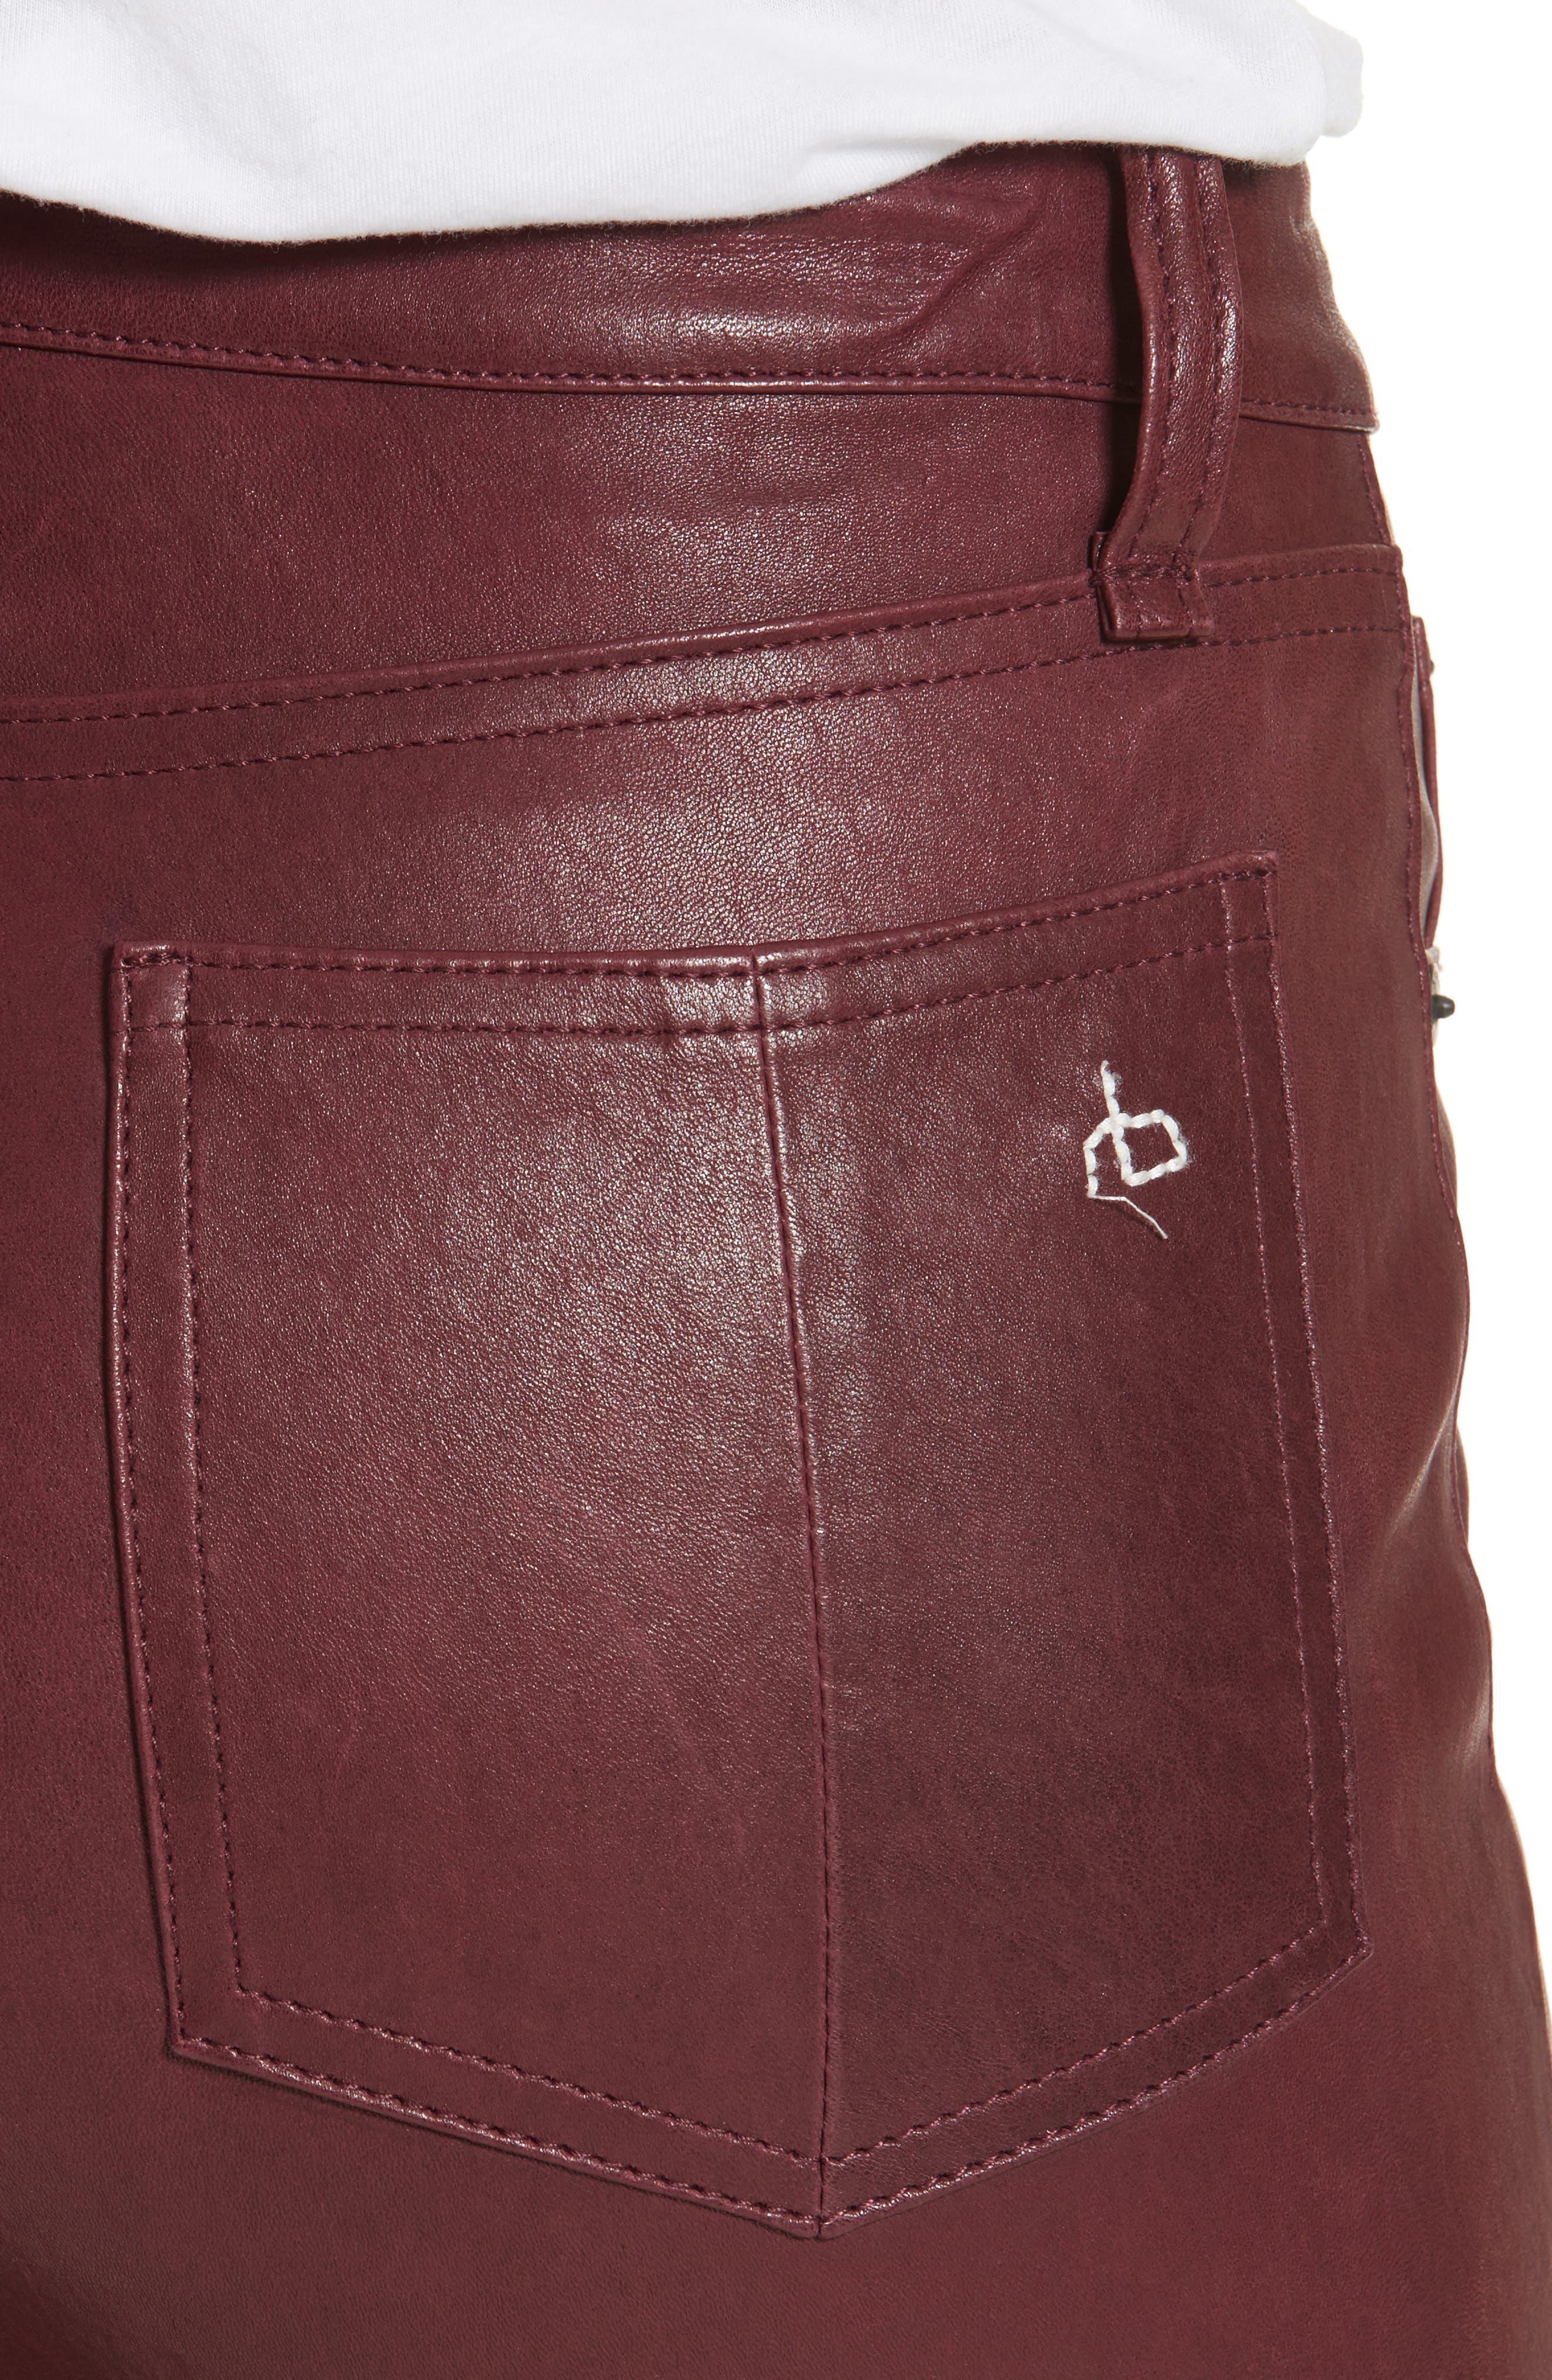 Lambskin Leather Pants,                             Alternate thumbnail 16, color,